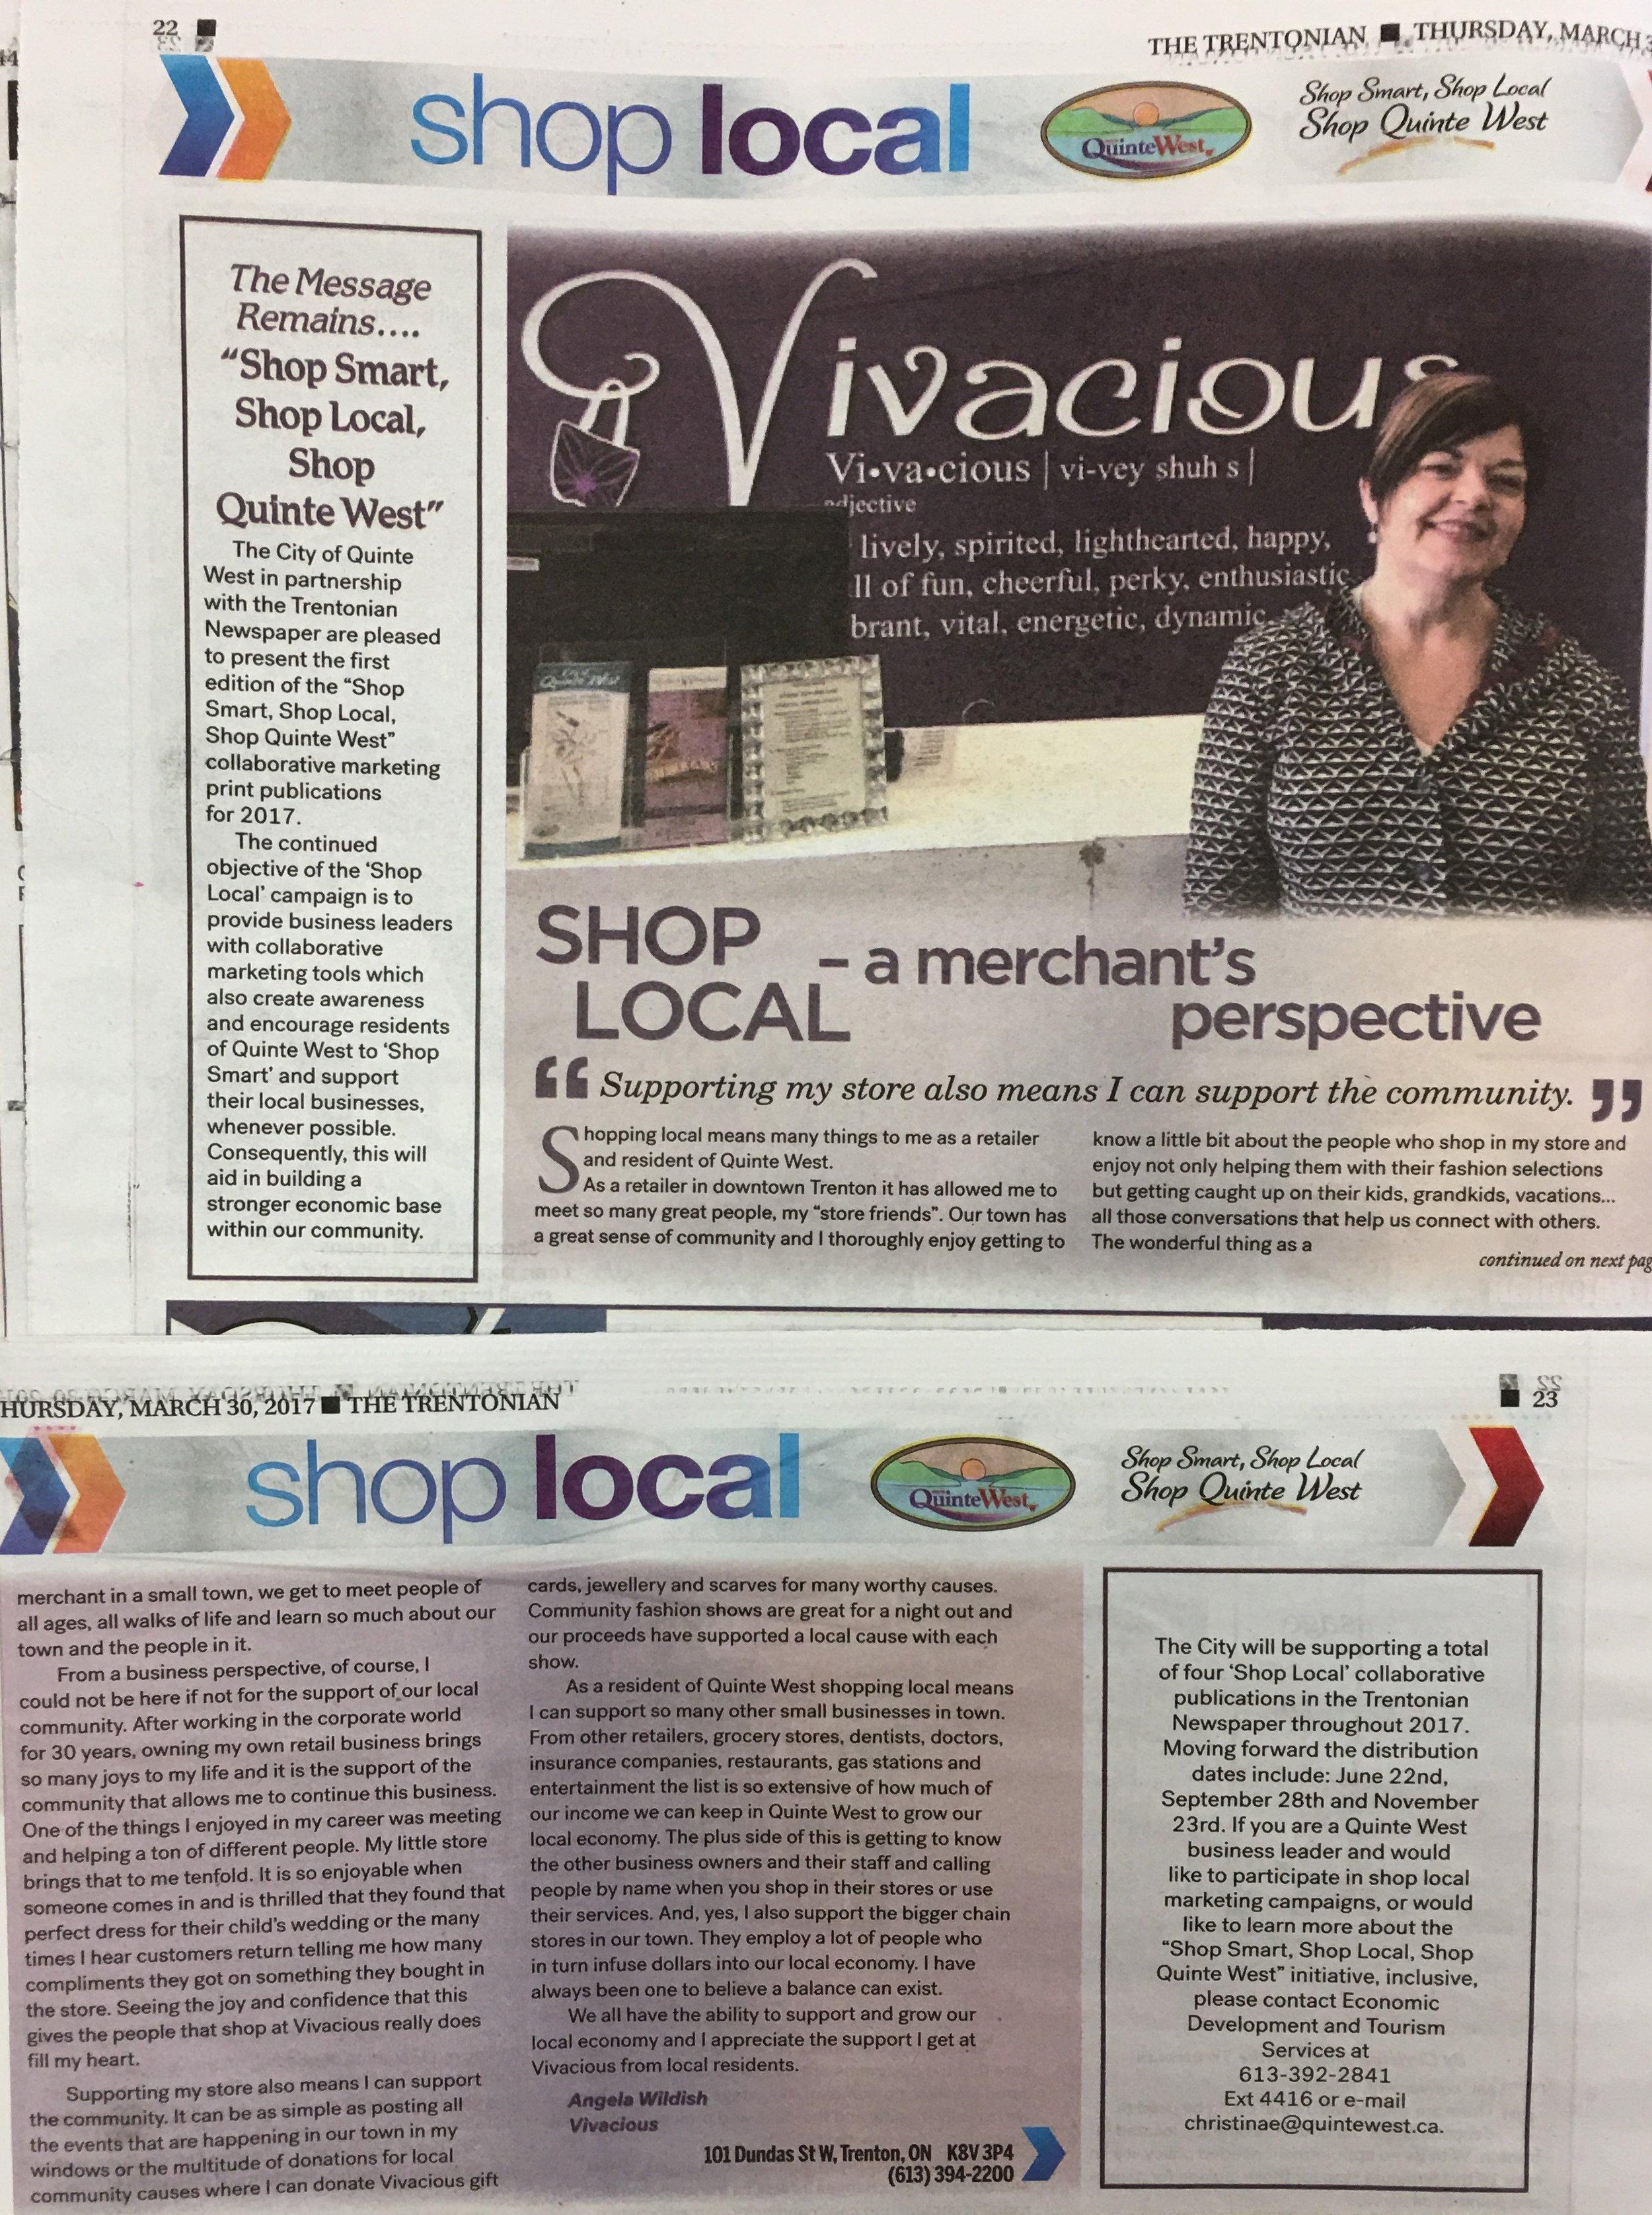 shop local article.jpg